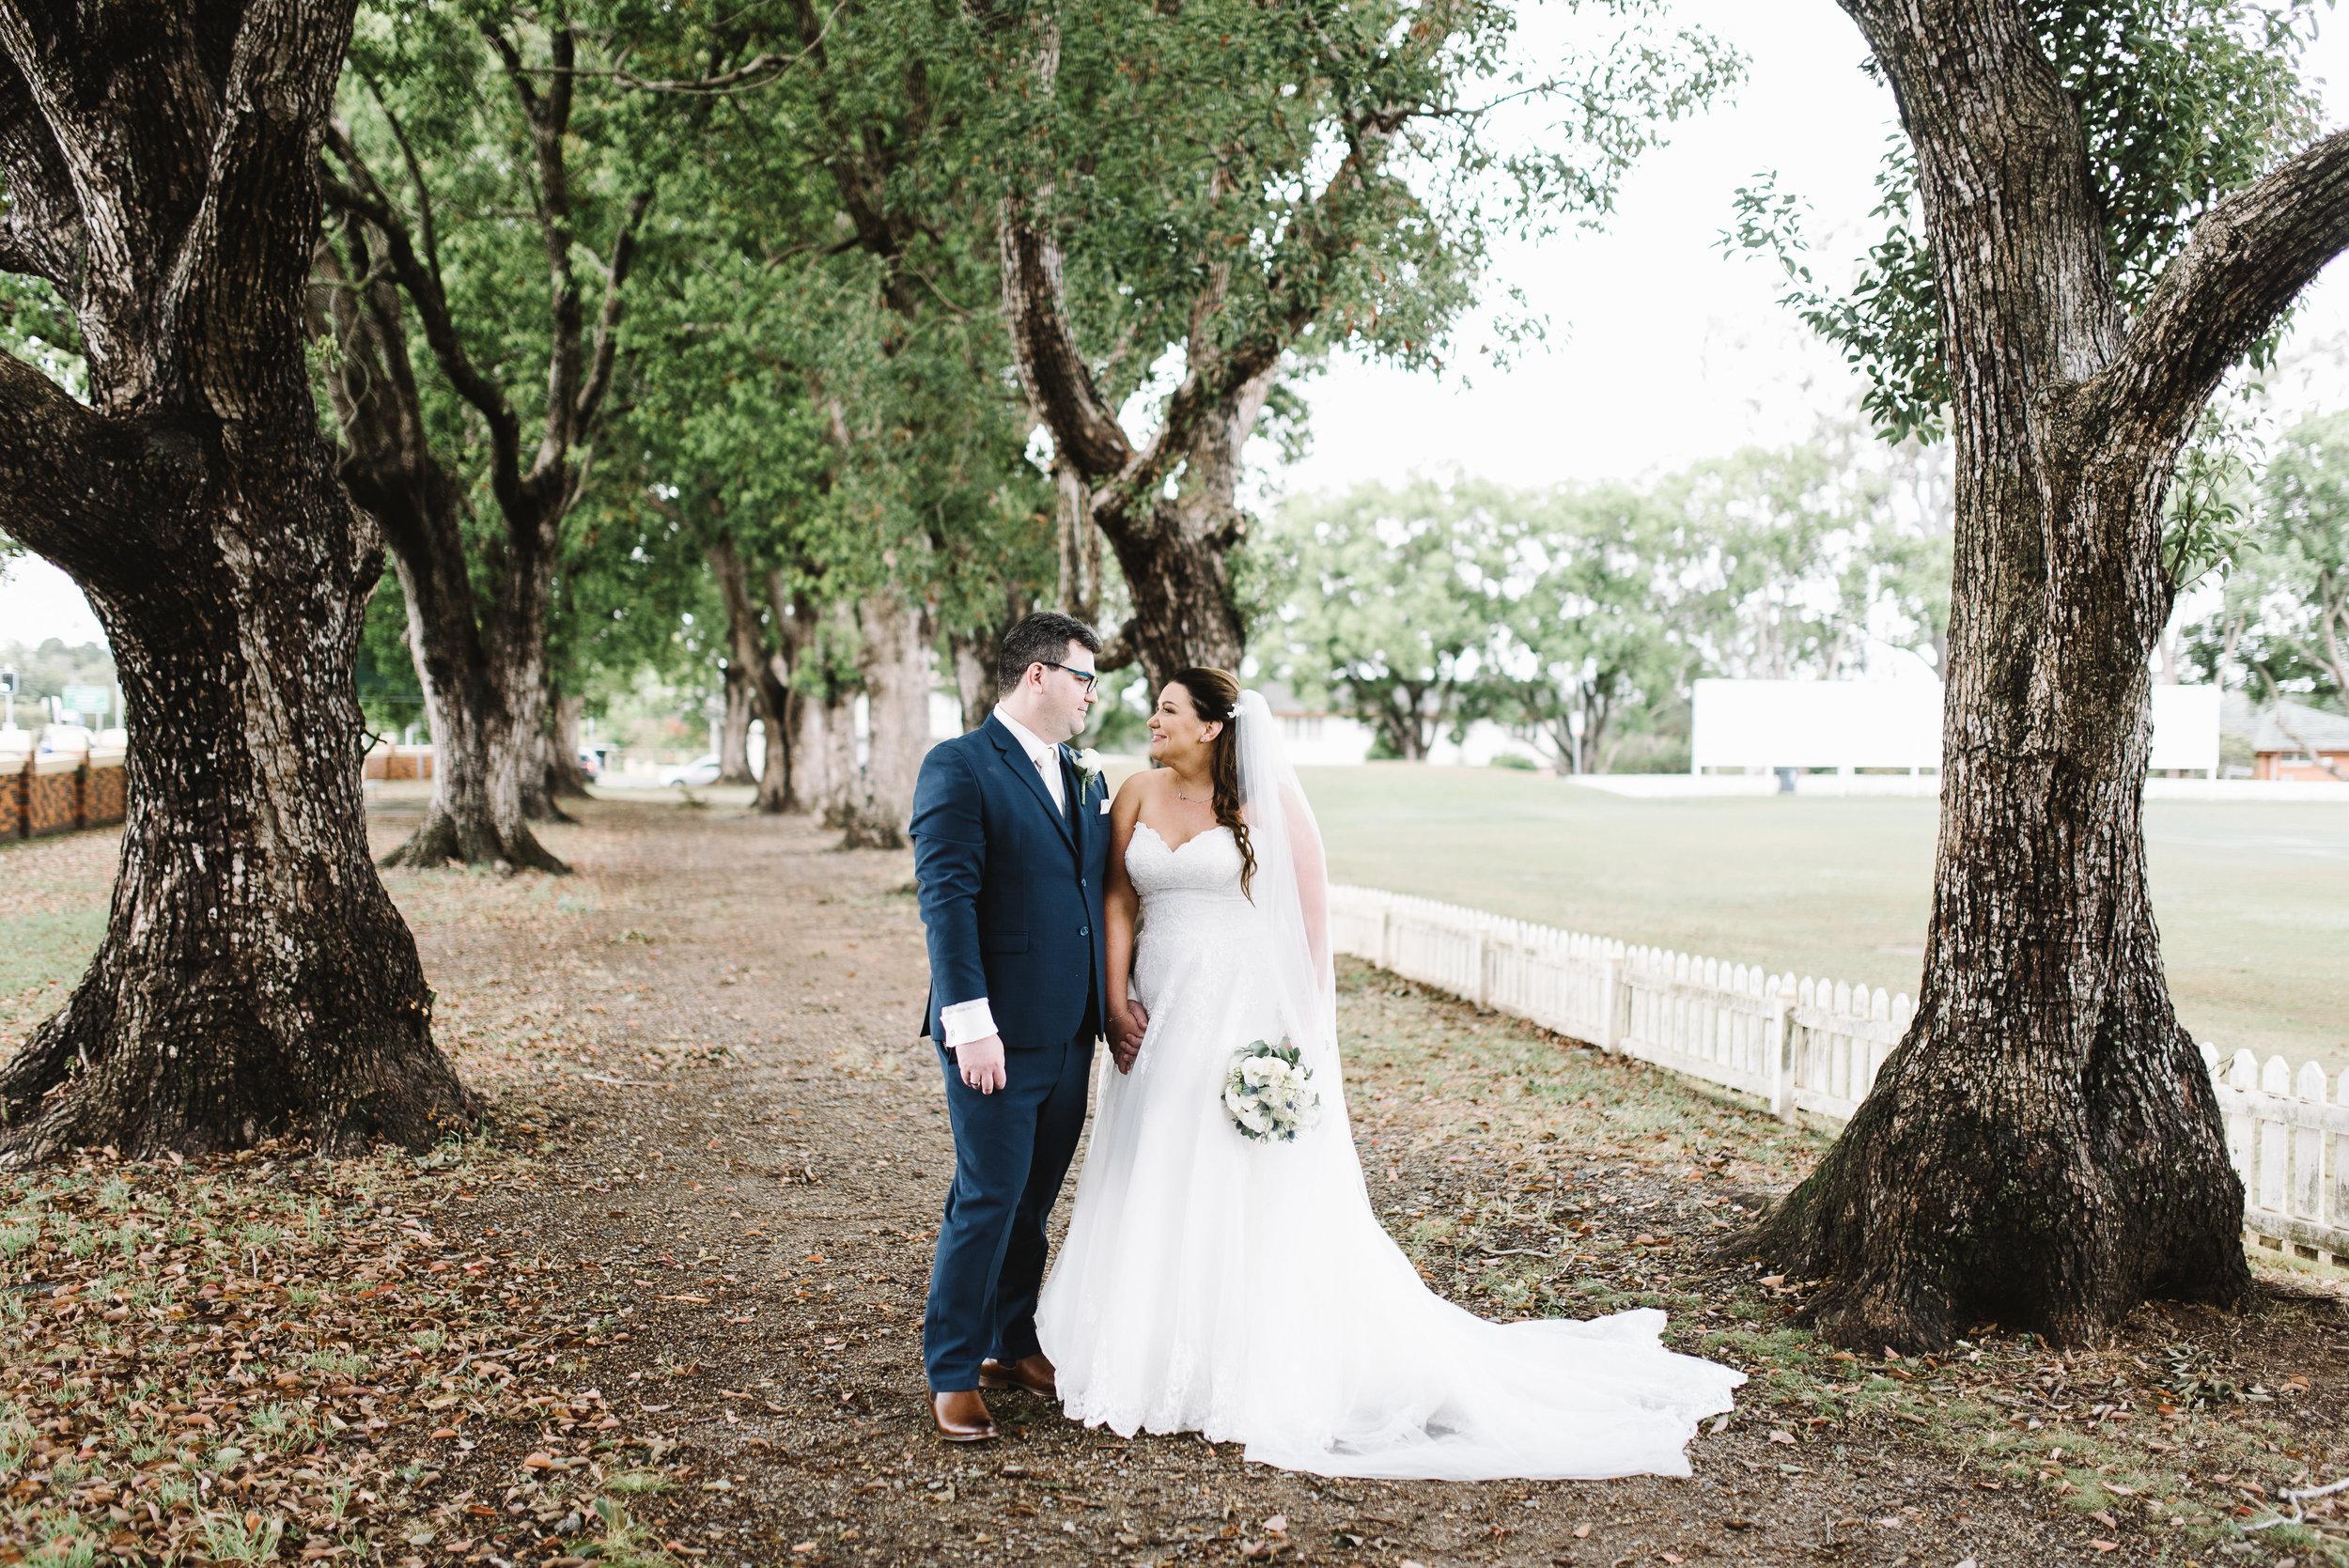 brisbane-wedding-photographer-62.jpg